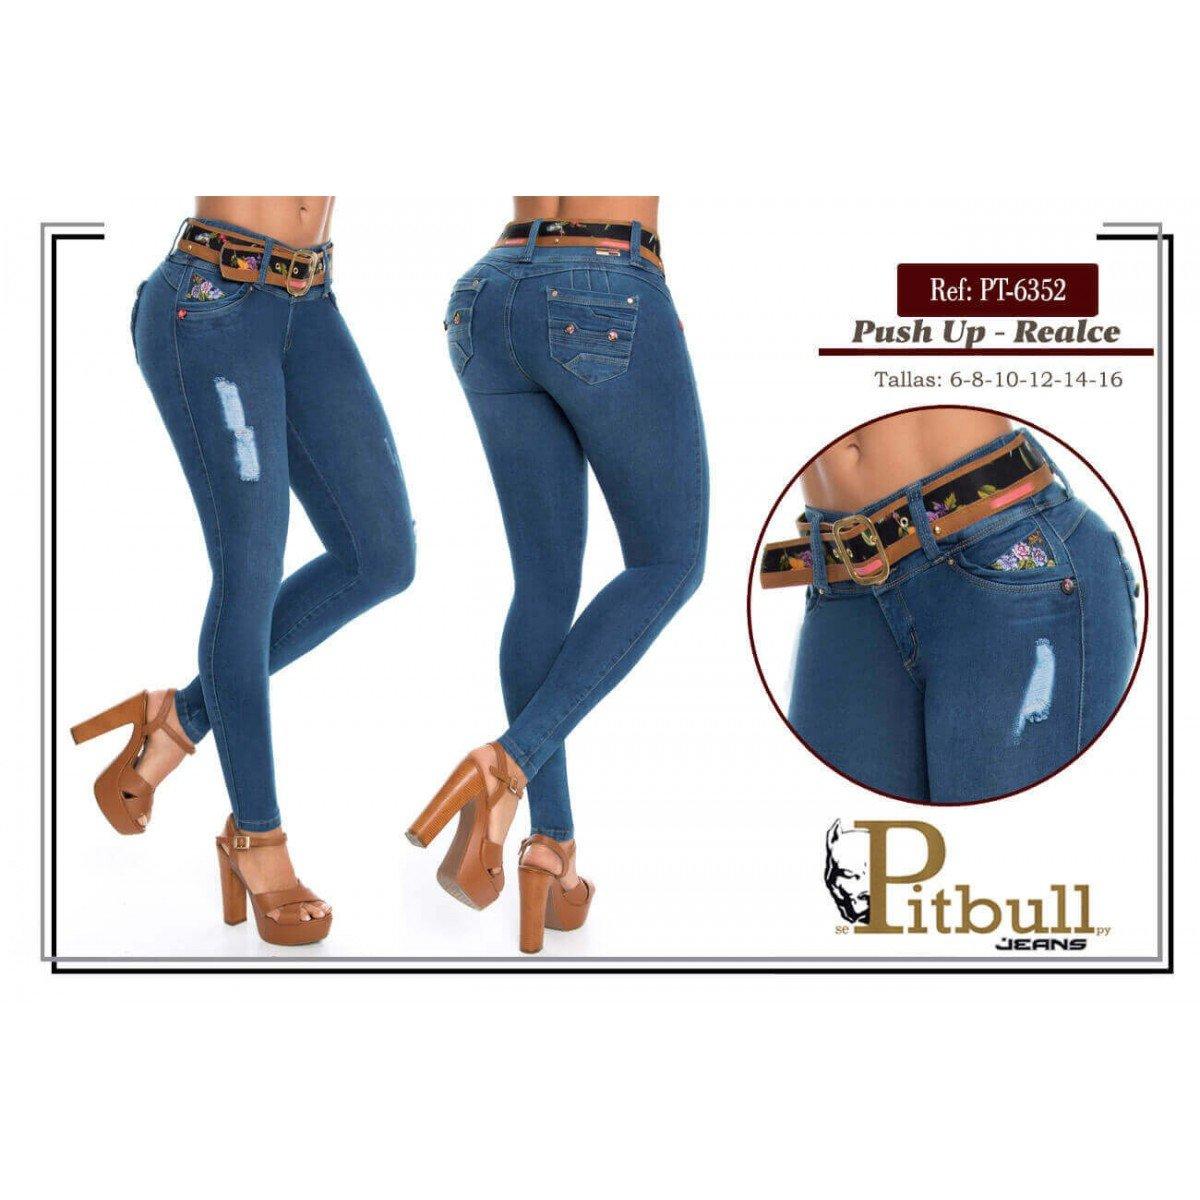 pantalon-colombiano-pitbull-pt6352